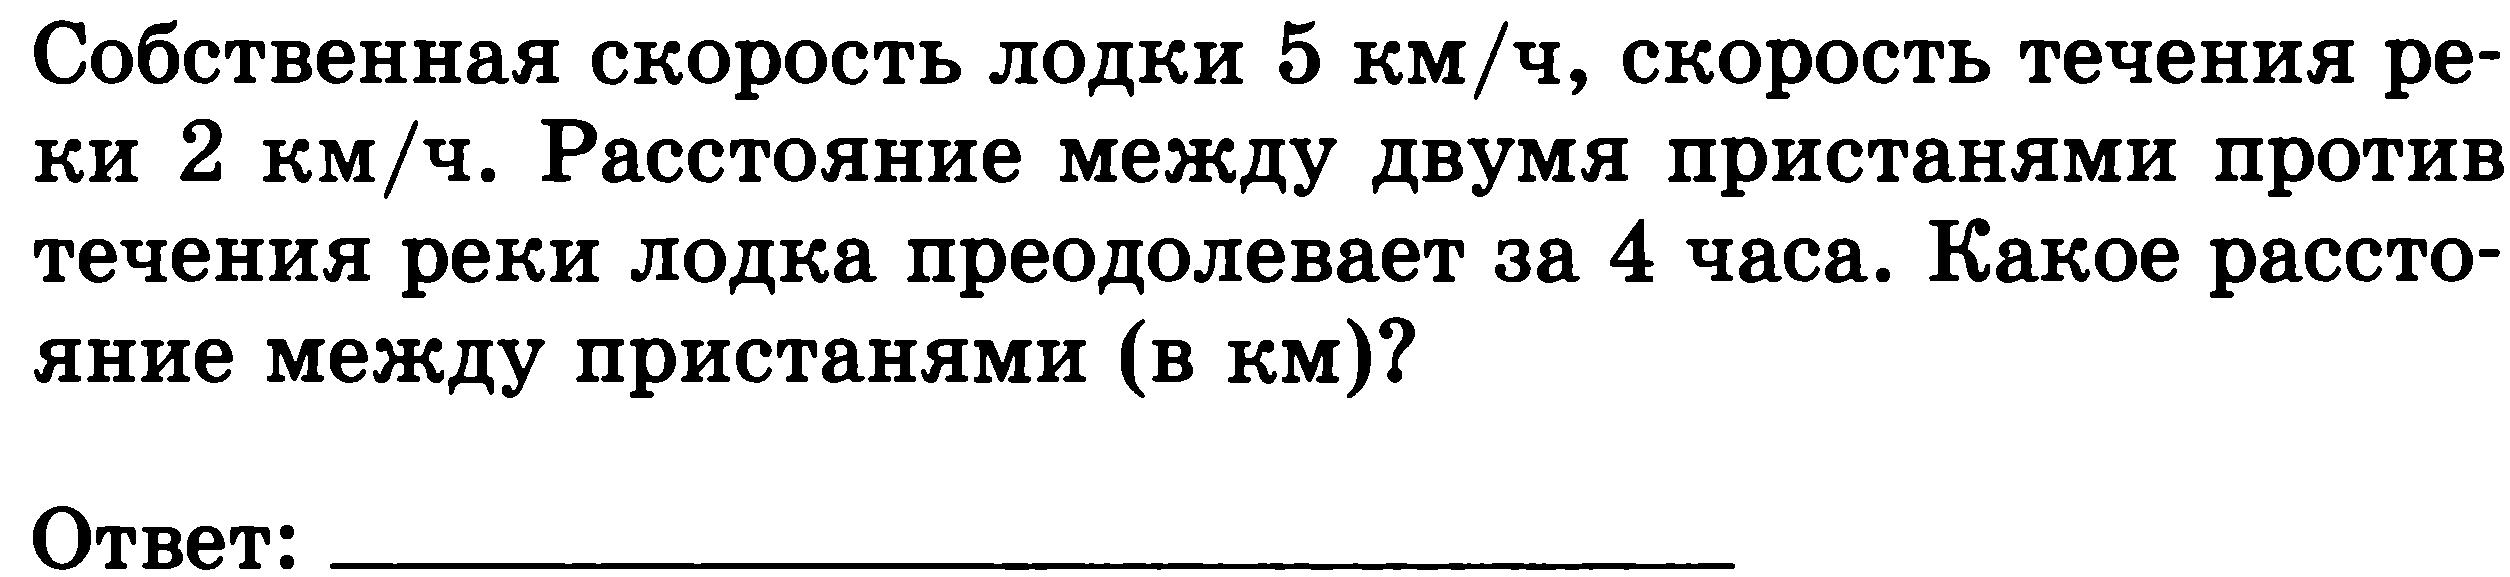 hello_html_m63ddd219.png